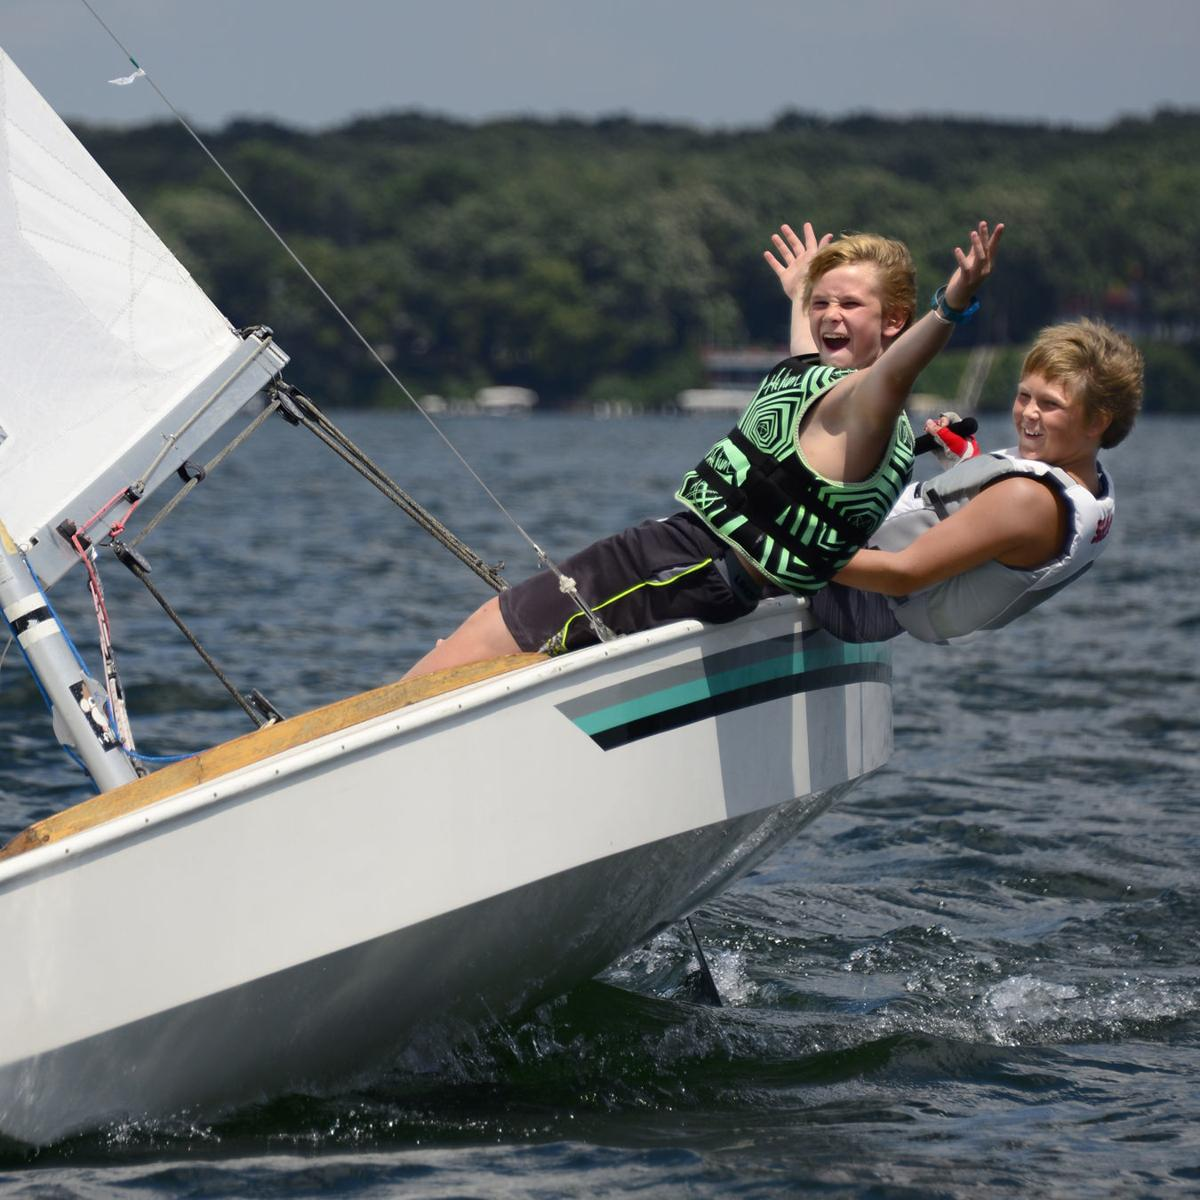 sailing school kid shot